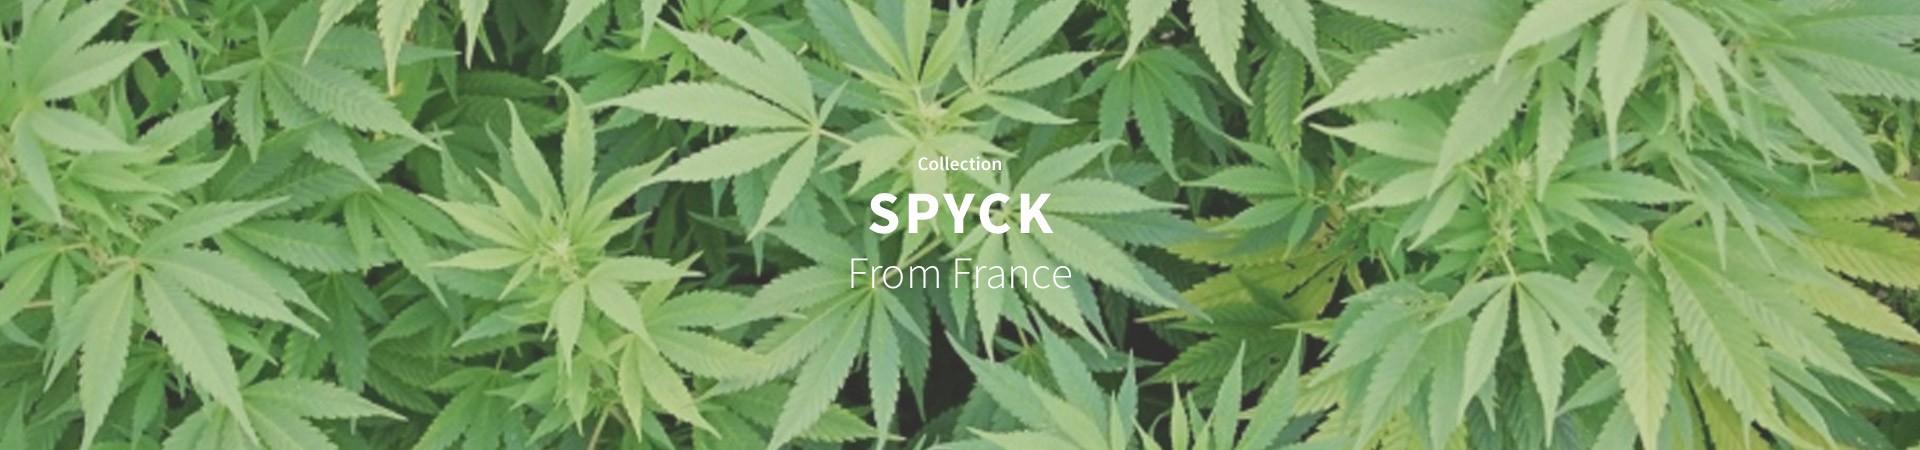 Spyck